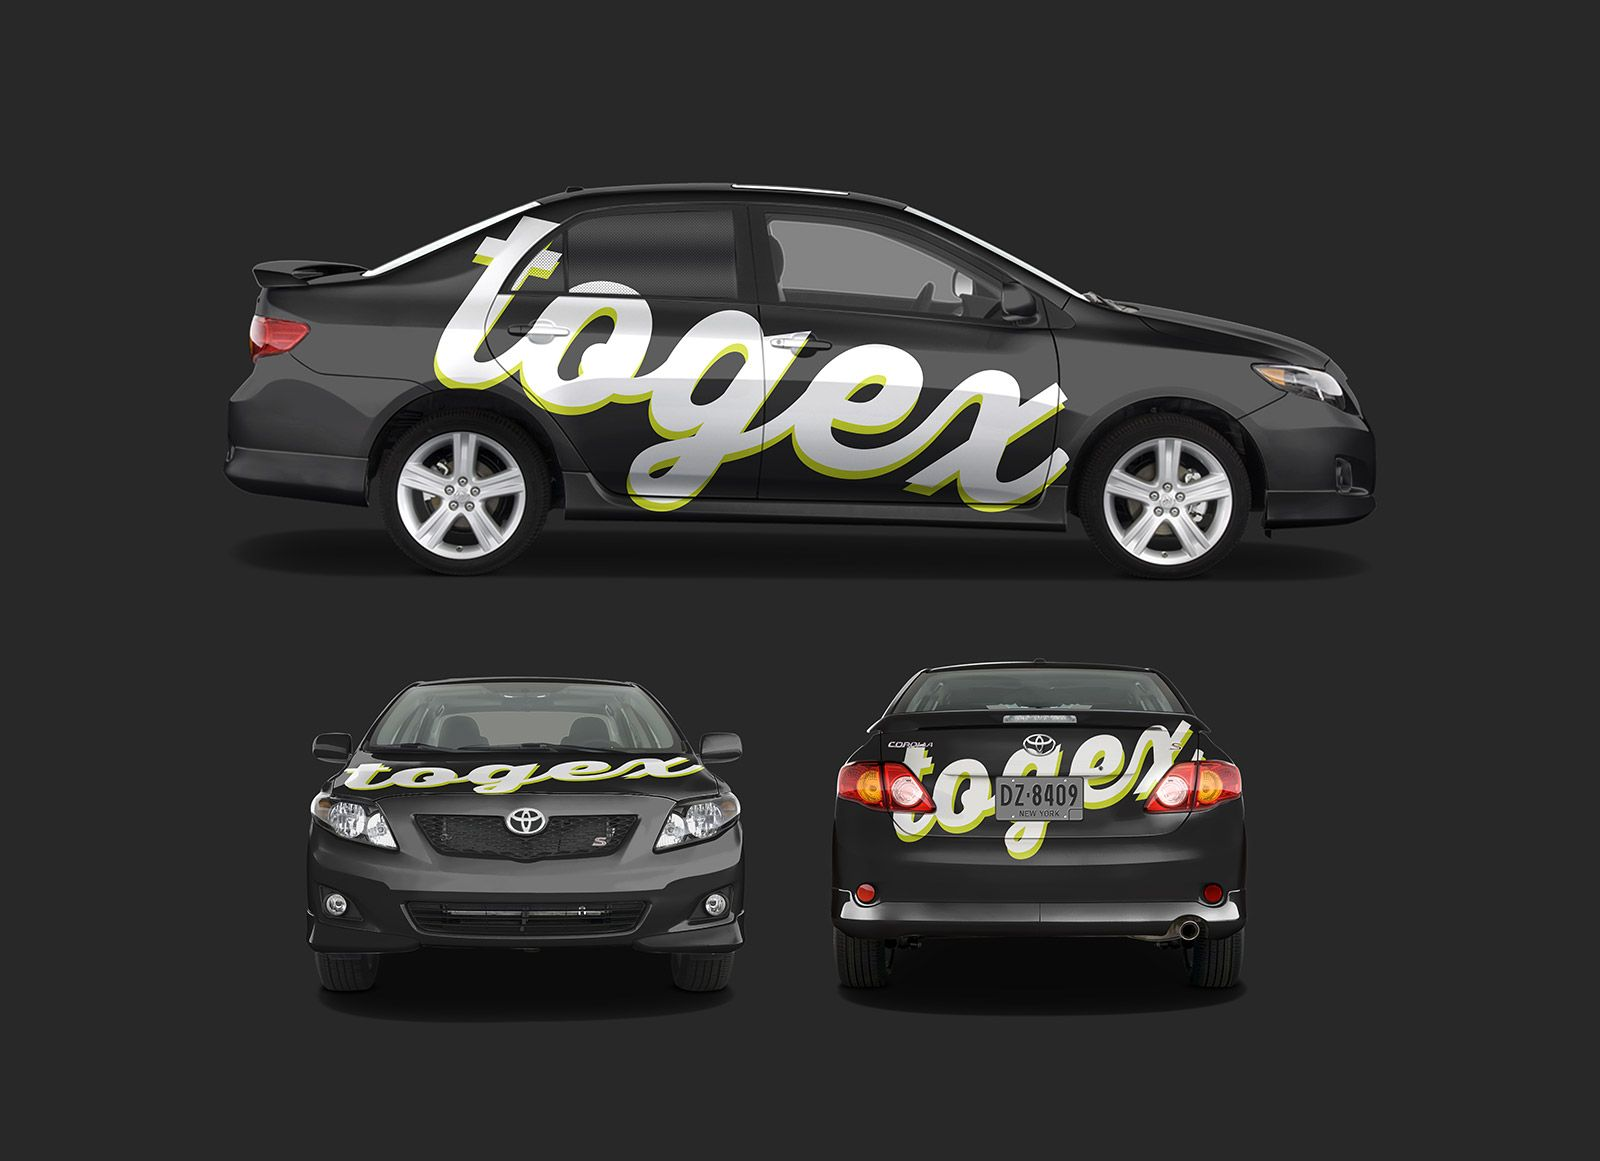 Free Toyota Corolla Car Branding Mockup Psd In 2021 Toyota Corolla Branding Mockups Corolla Car